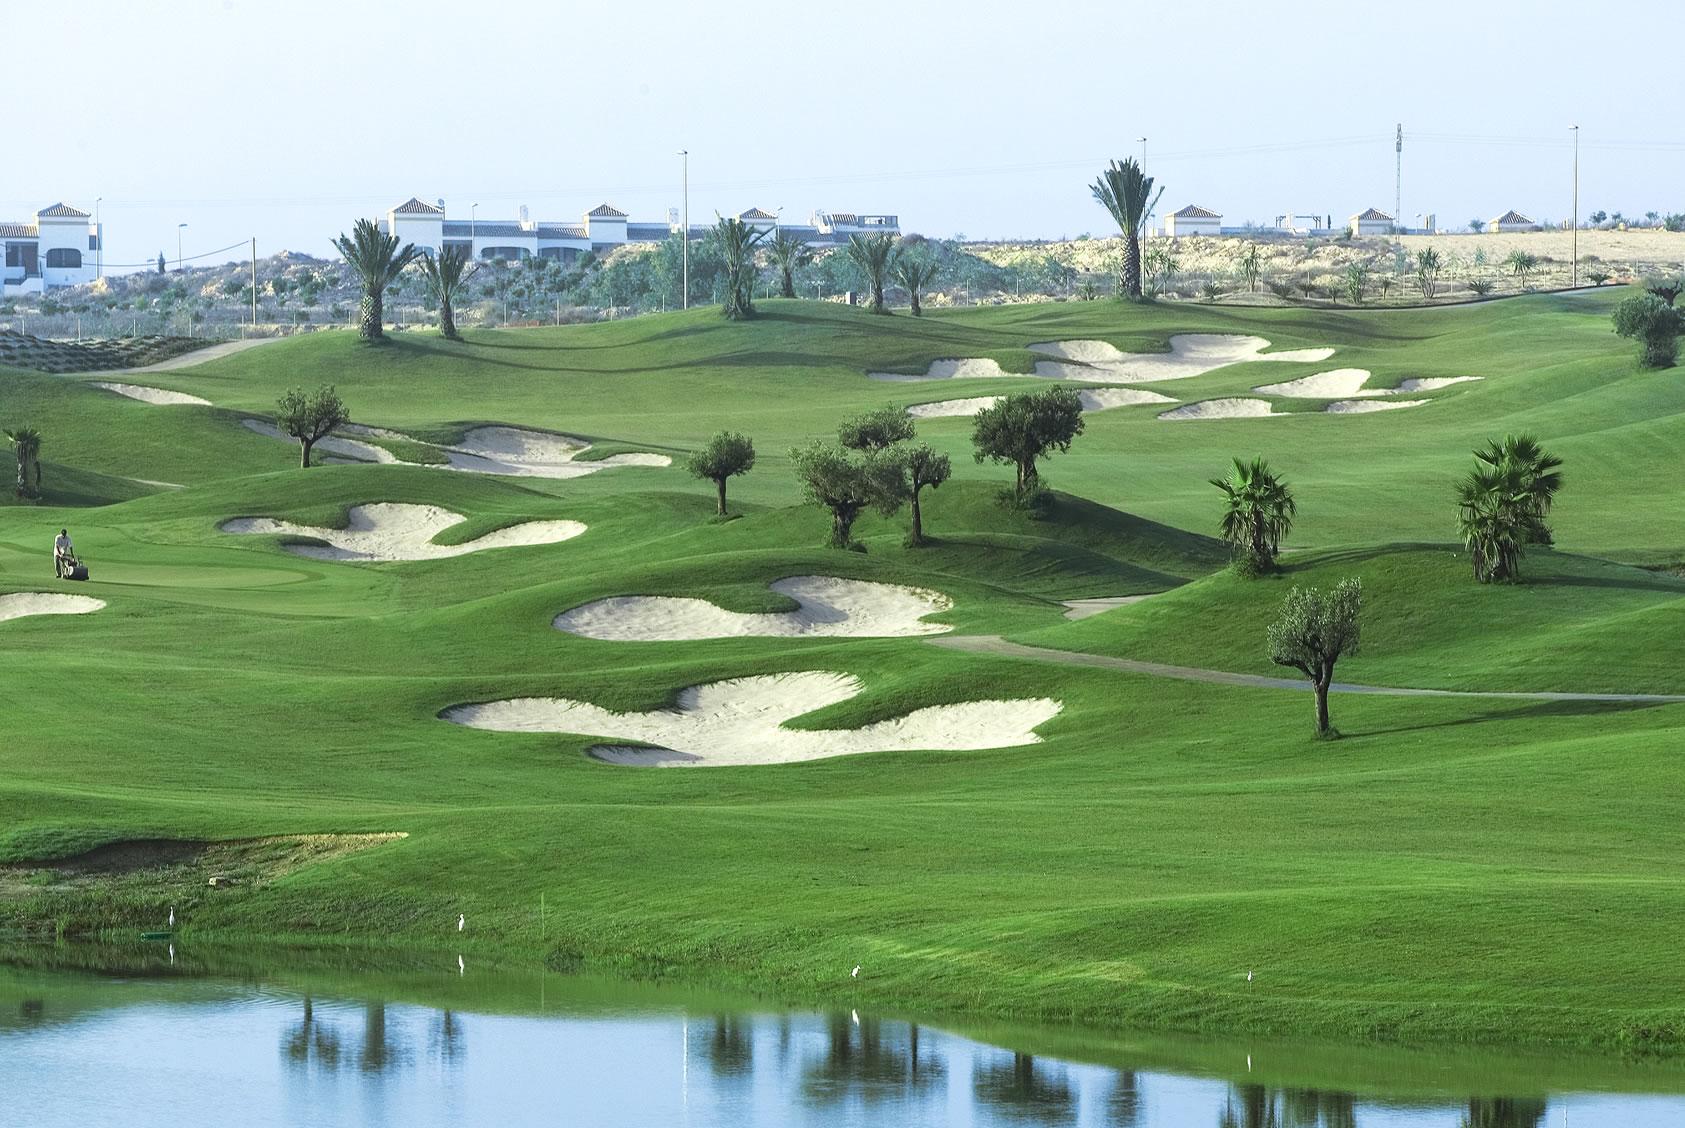 Vistabella golf DirWind               Humidity               Comfort Lvl               Rain